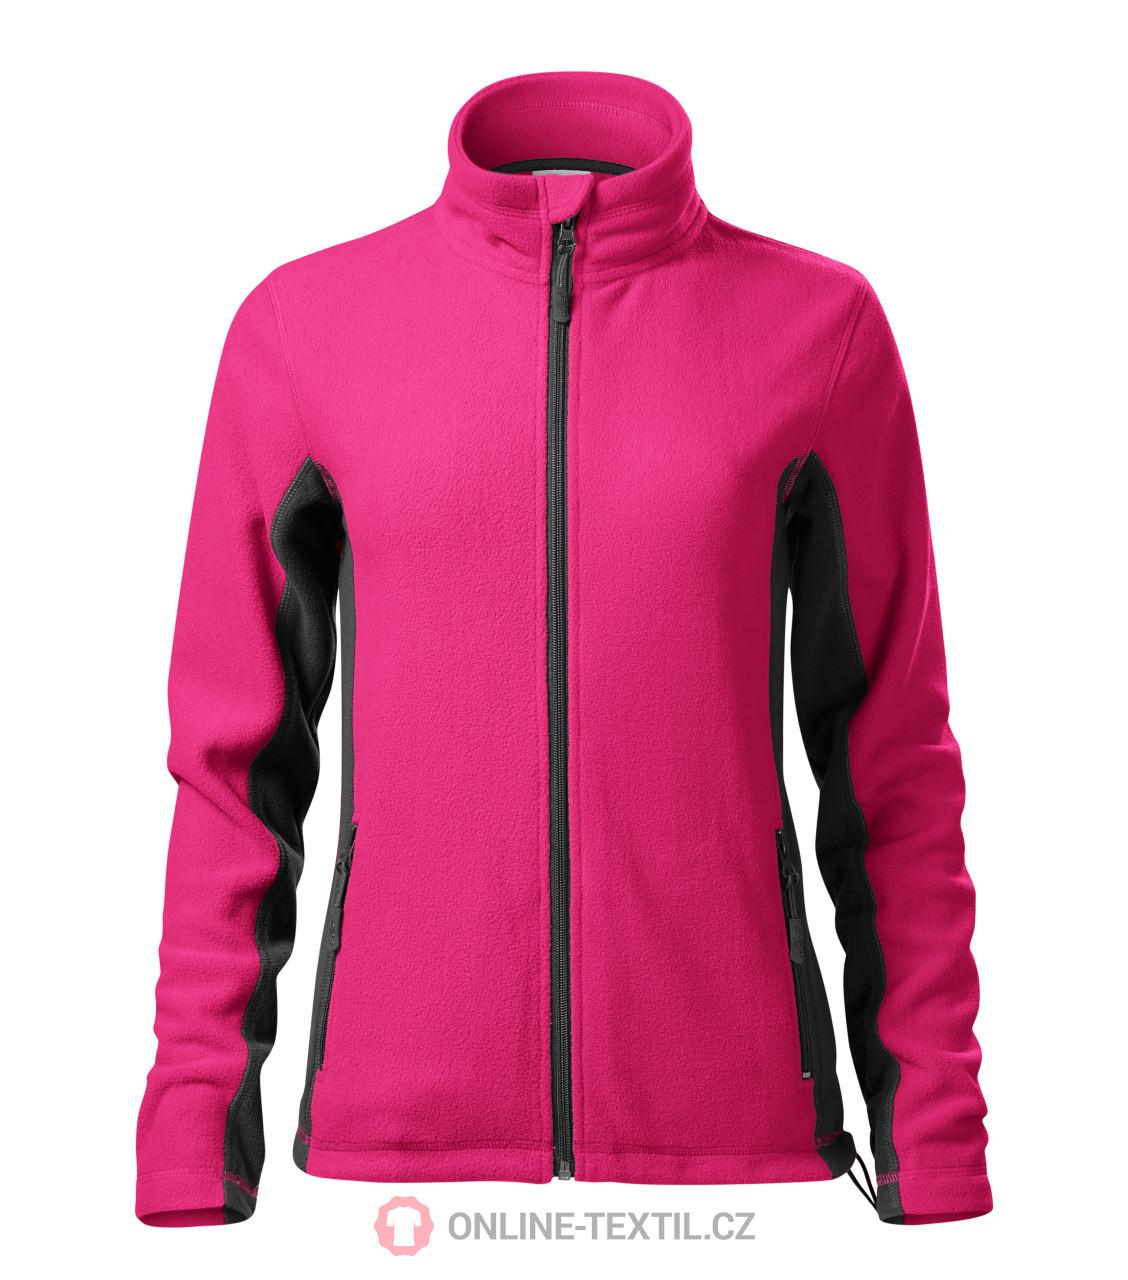 9e12b76bfc5d ADLER CZECH Dámska fleece bunda mikina Frosty 528 - purpurová z ...